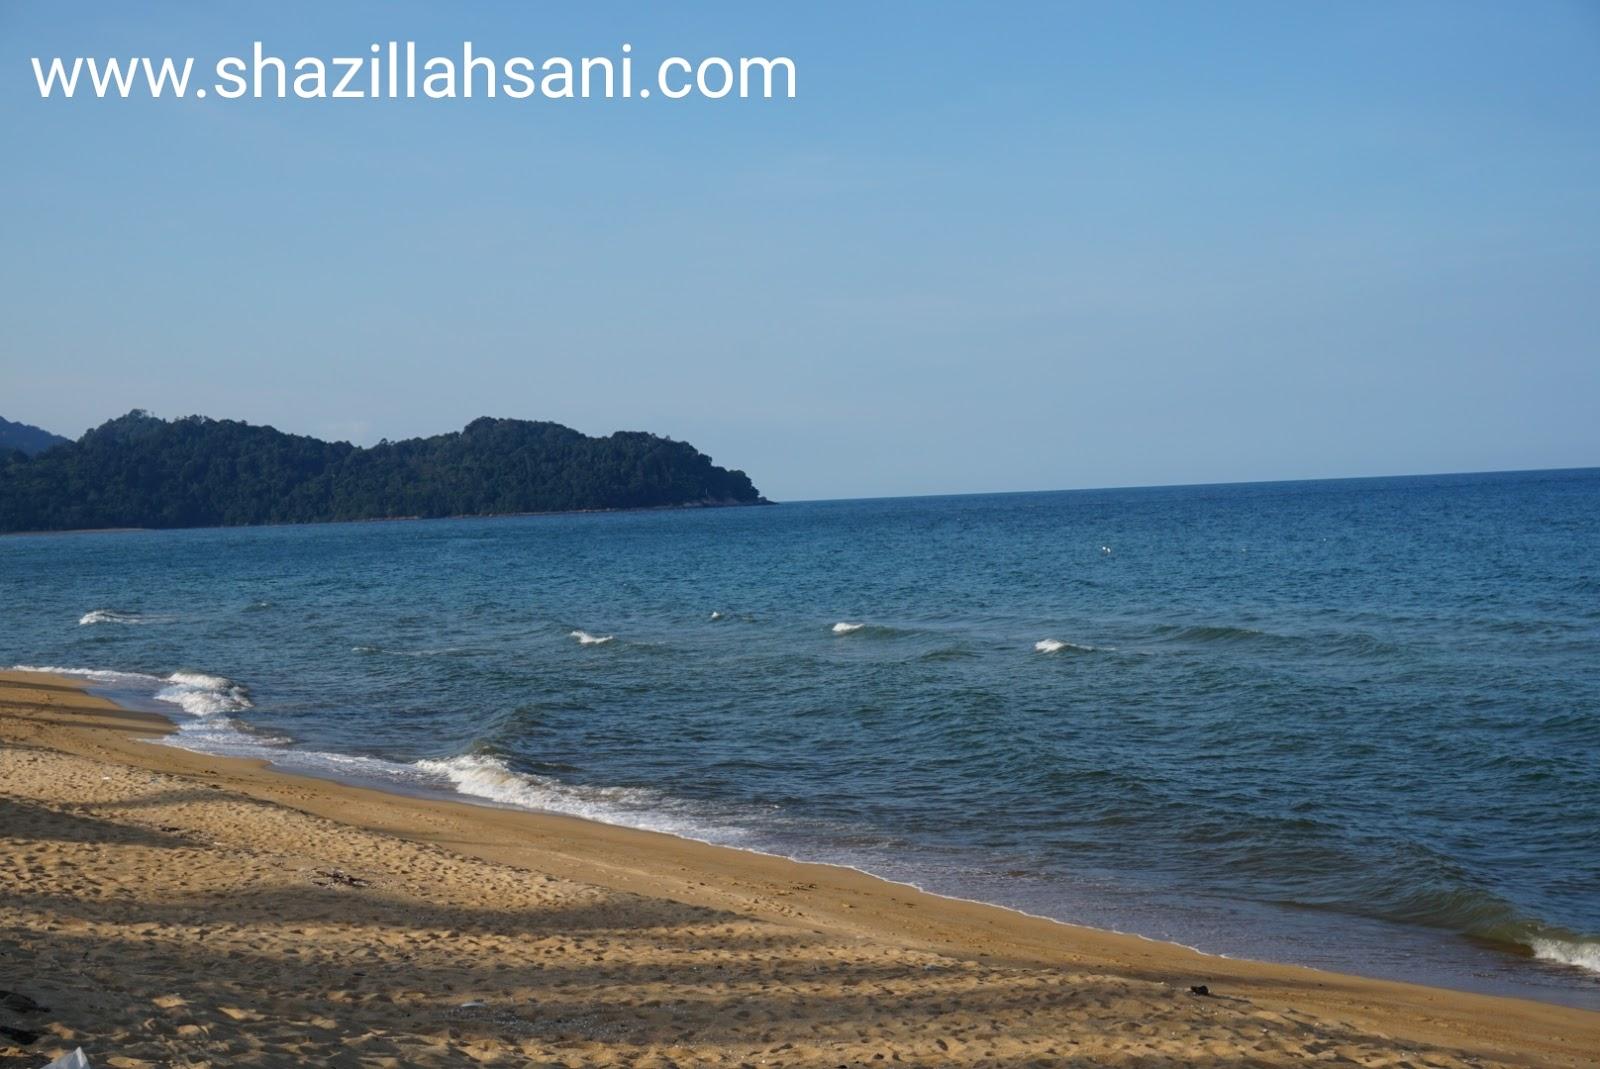 1505276654839 Of Pantai Paka Di Terengganu Tempat Menarik Yang Memukau Untuk Tenangkan Fikiran